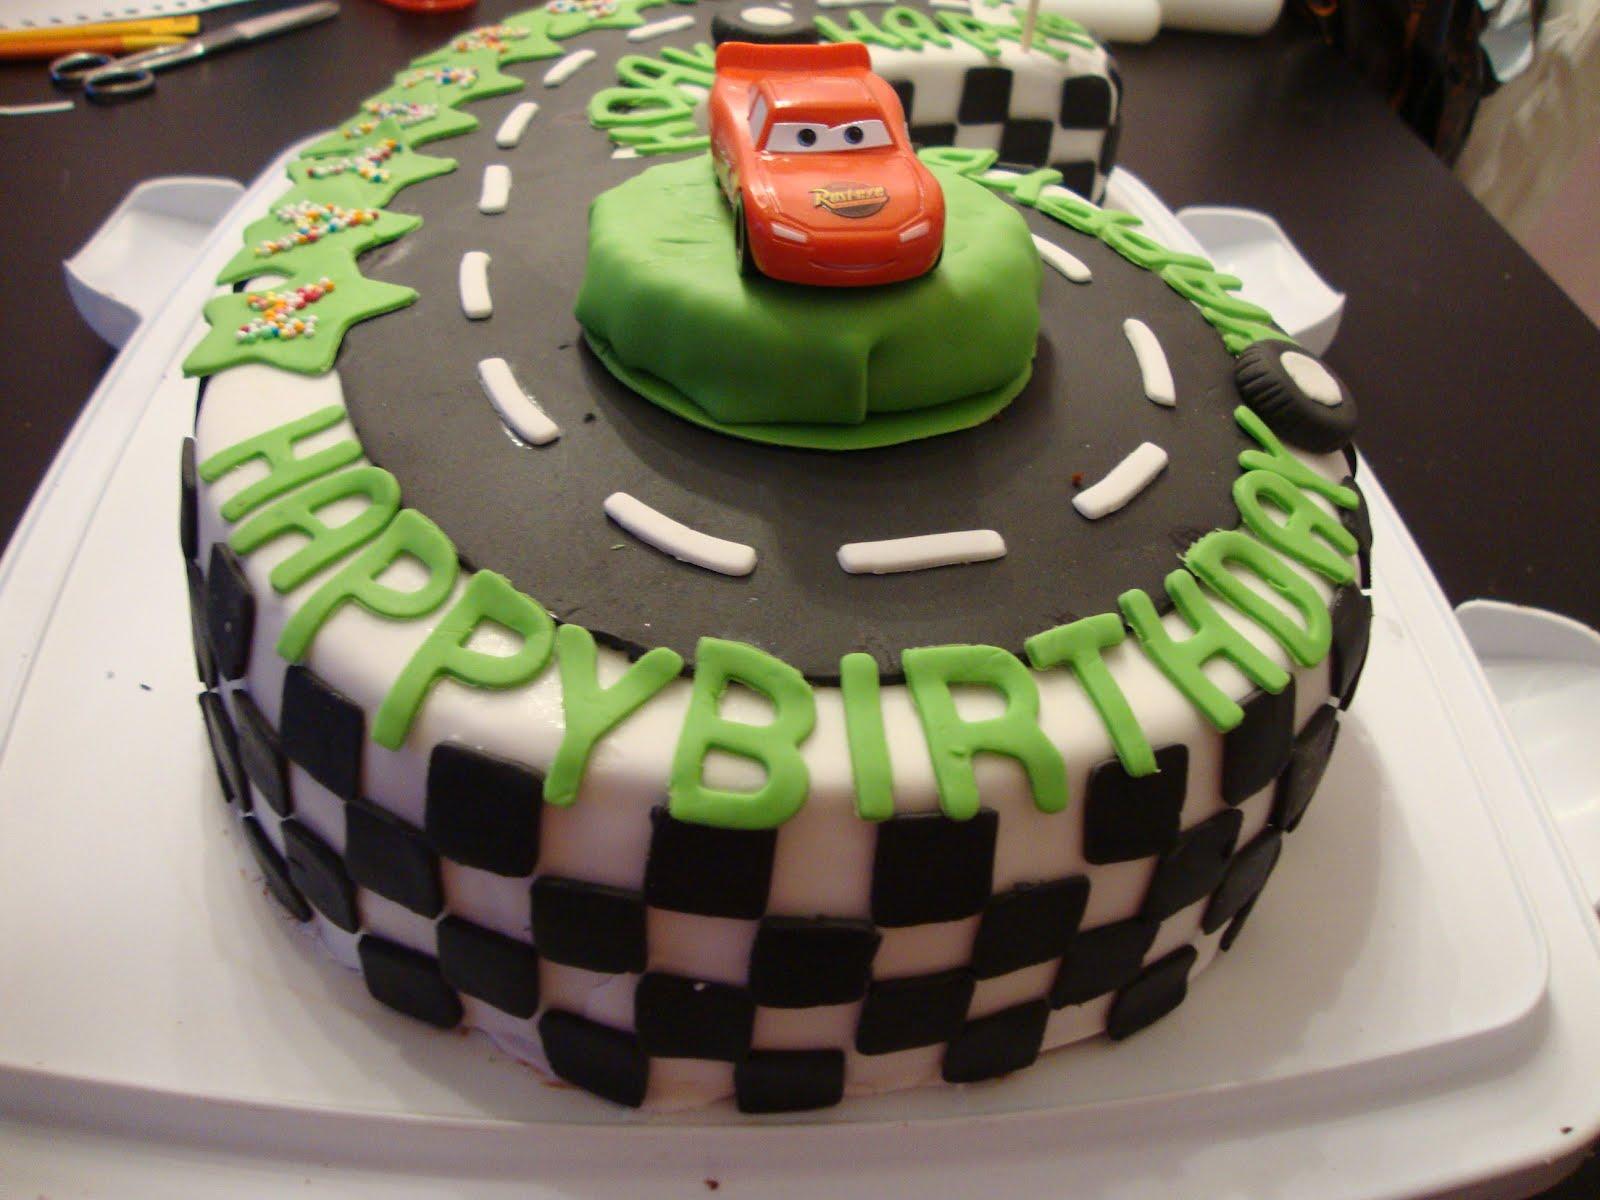 Pleasant 11 6Th Birthday Birthday Cakes For Boys Photo Boys 6Th Birthday Funny Birthday Cards Online Inifodamsfinfo